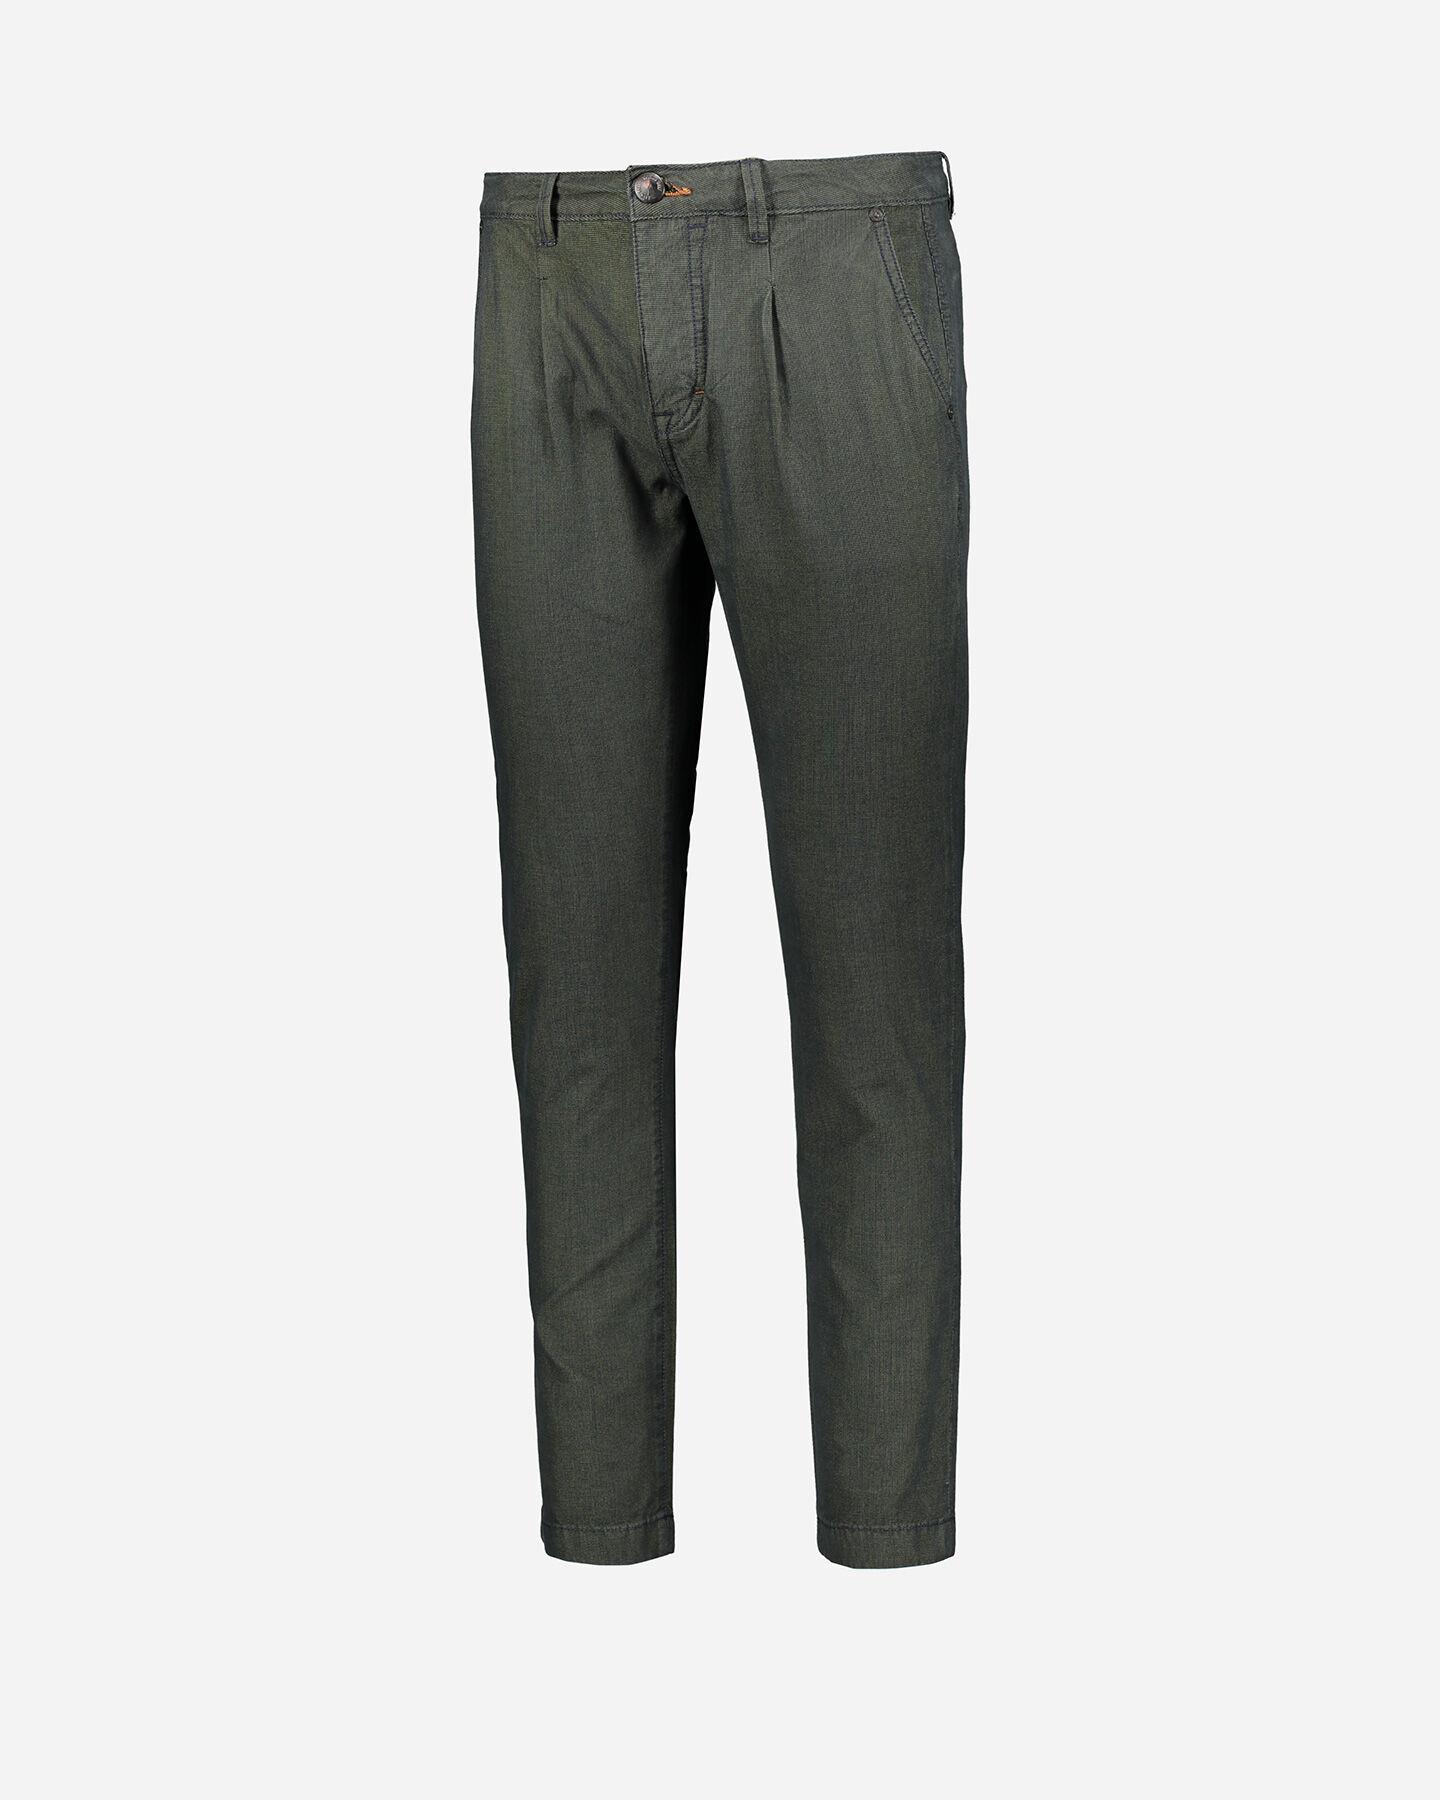 Pantalone COTTON BELT CHINO STRETCH M S4076644 scatto 4